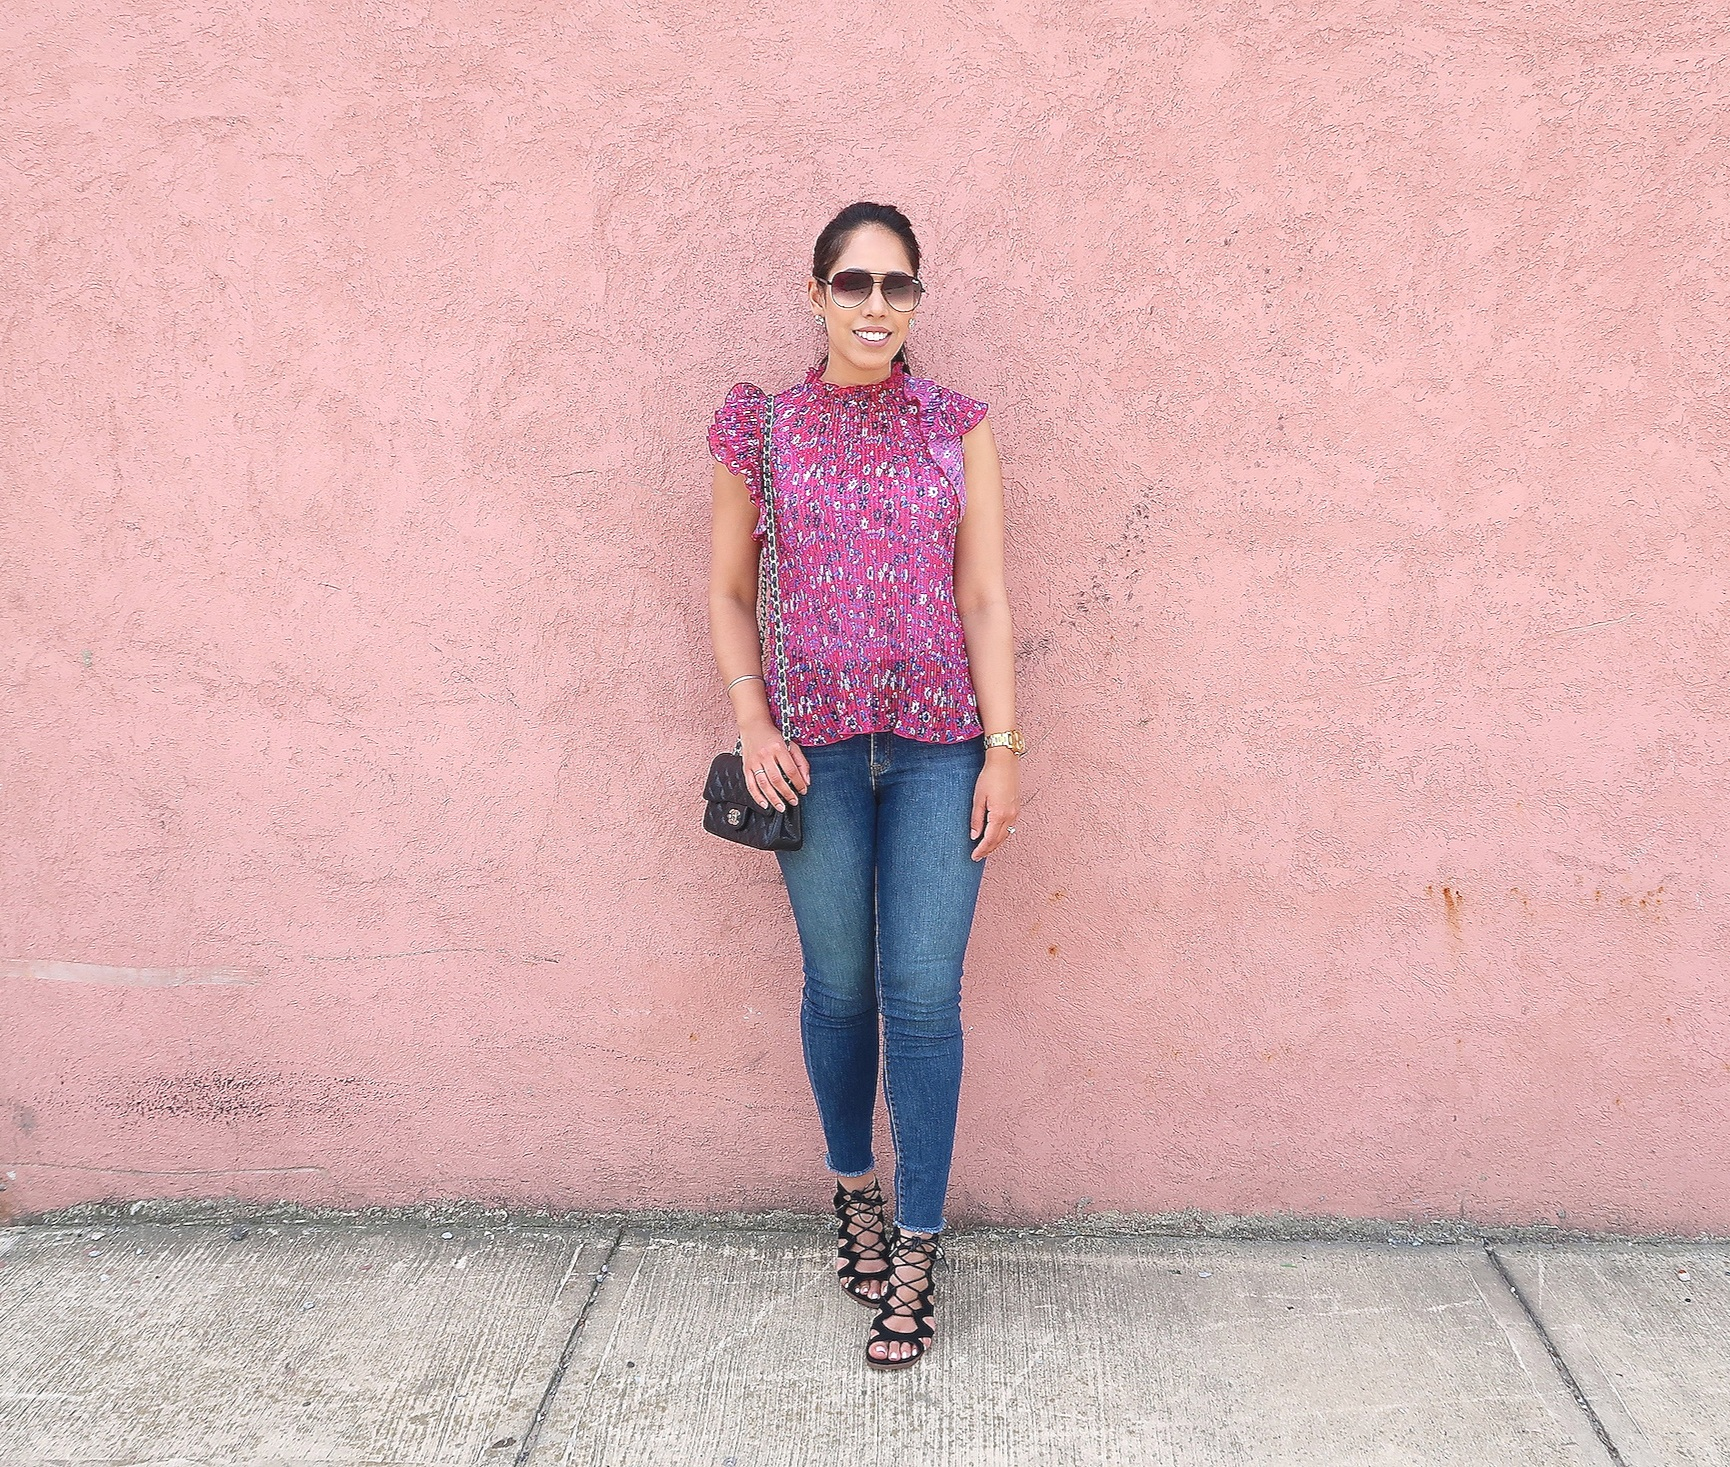 floral-blouse-fashion-summer-anthropologie.JPG